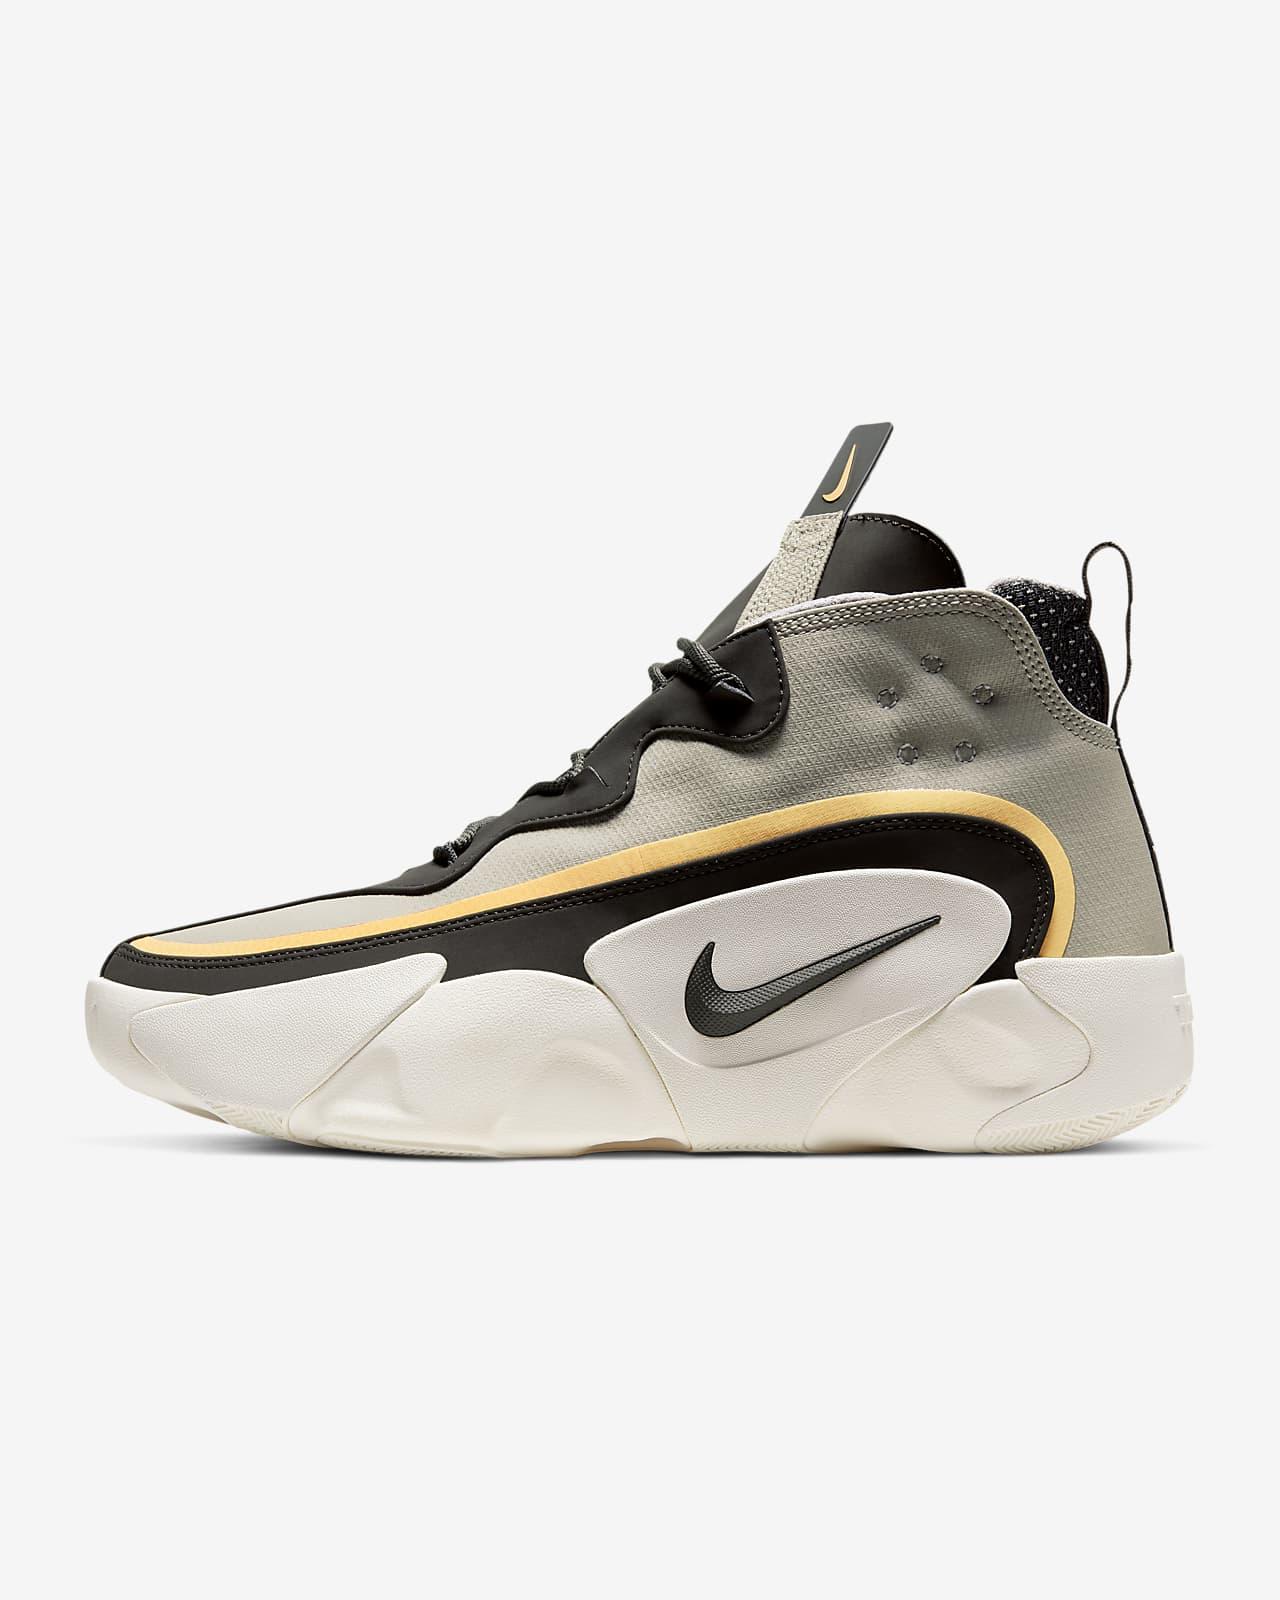 Secreto intermitente esculpir  Nike React Frenzy Men's Shoe. Nike.com